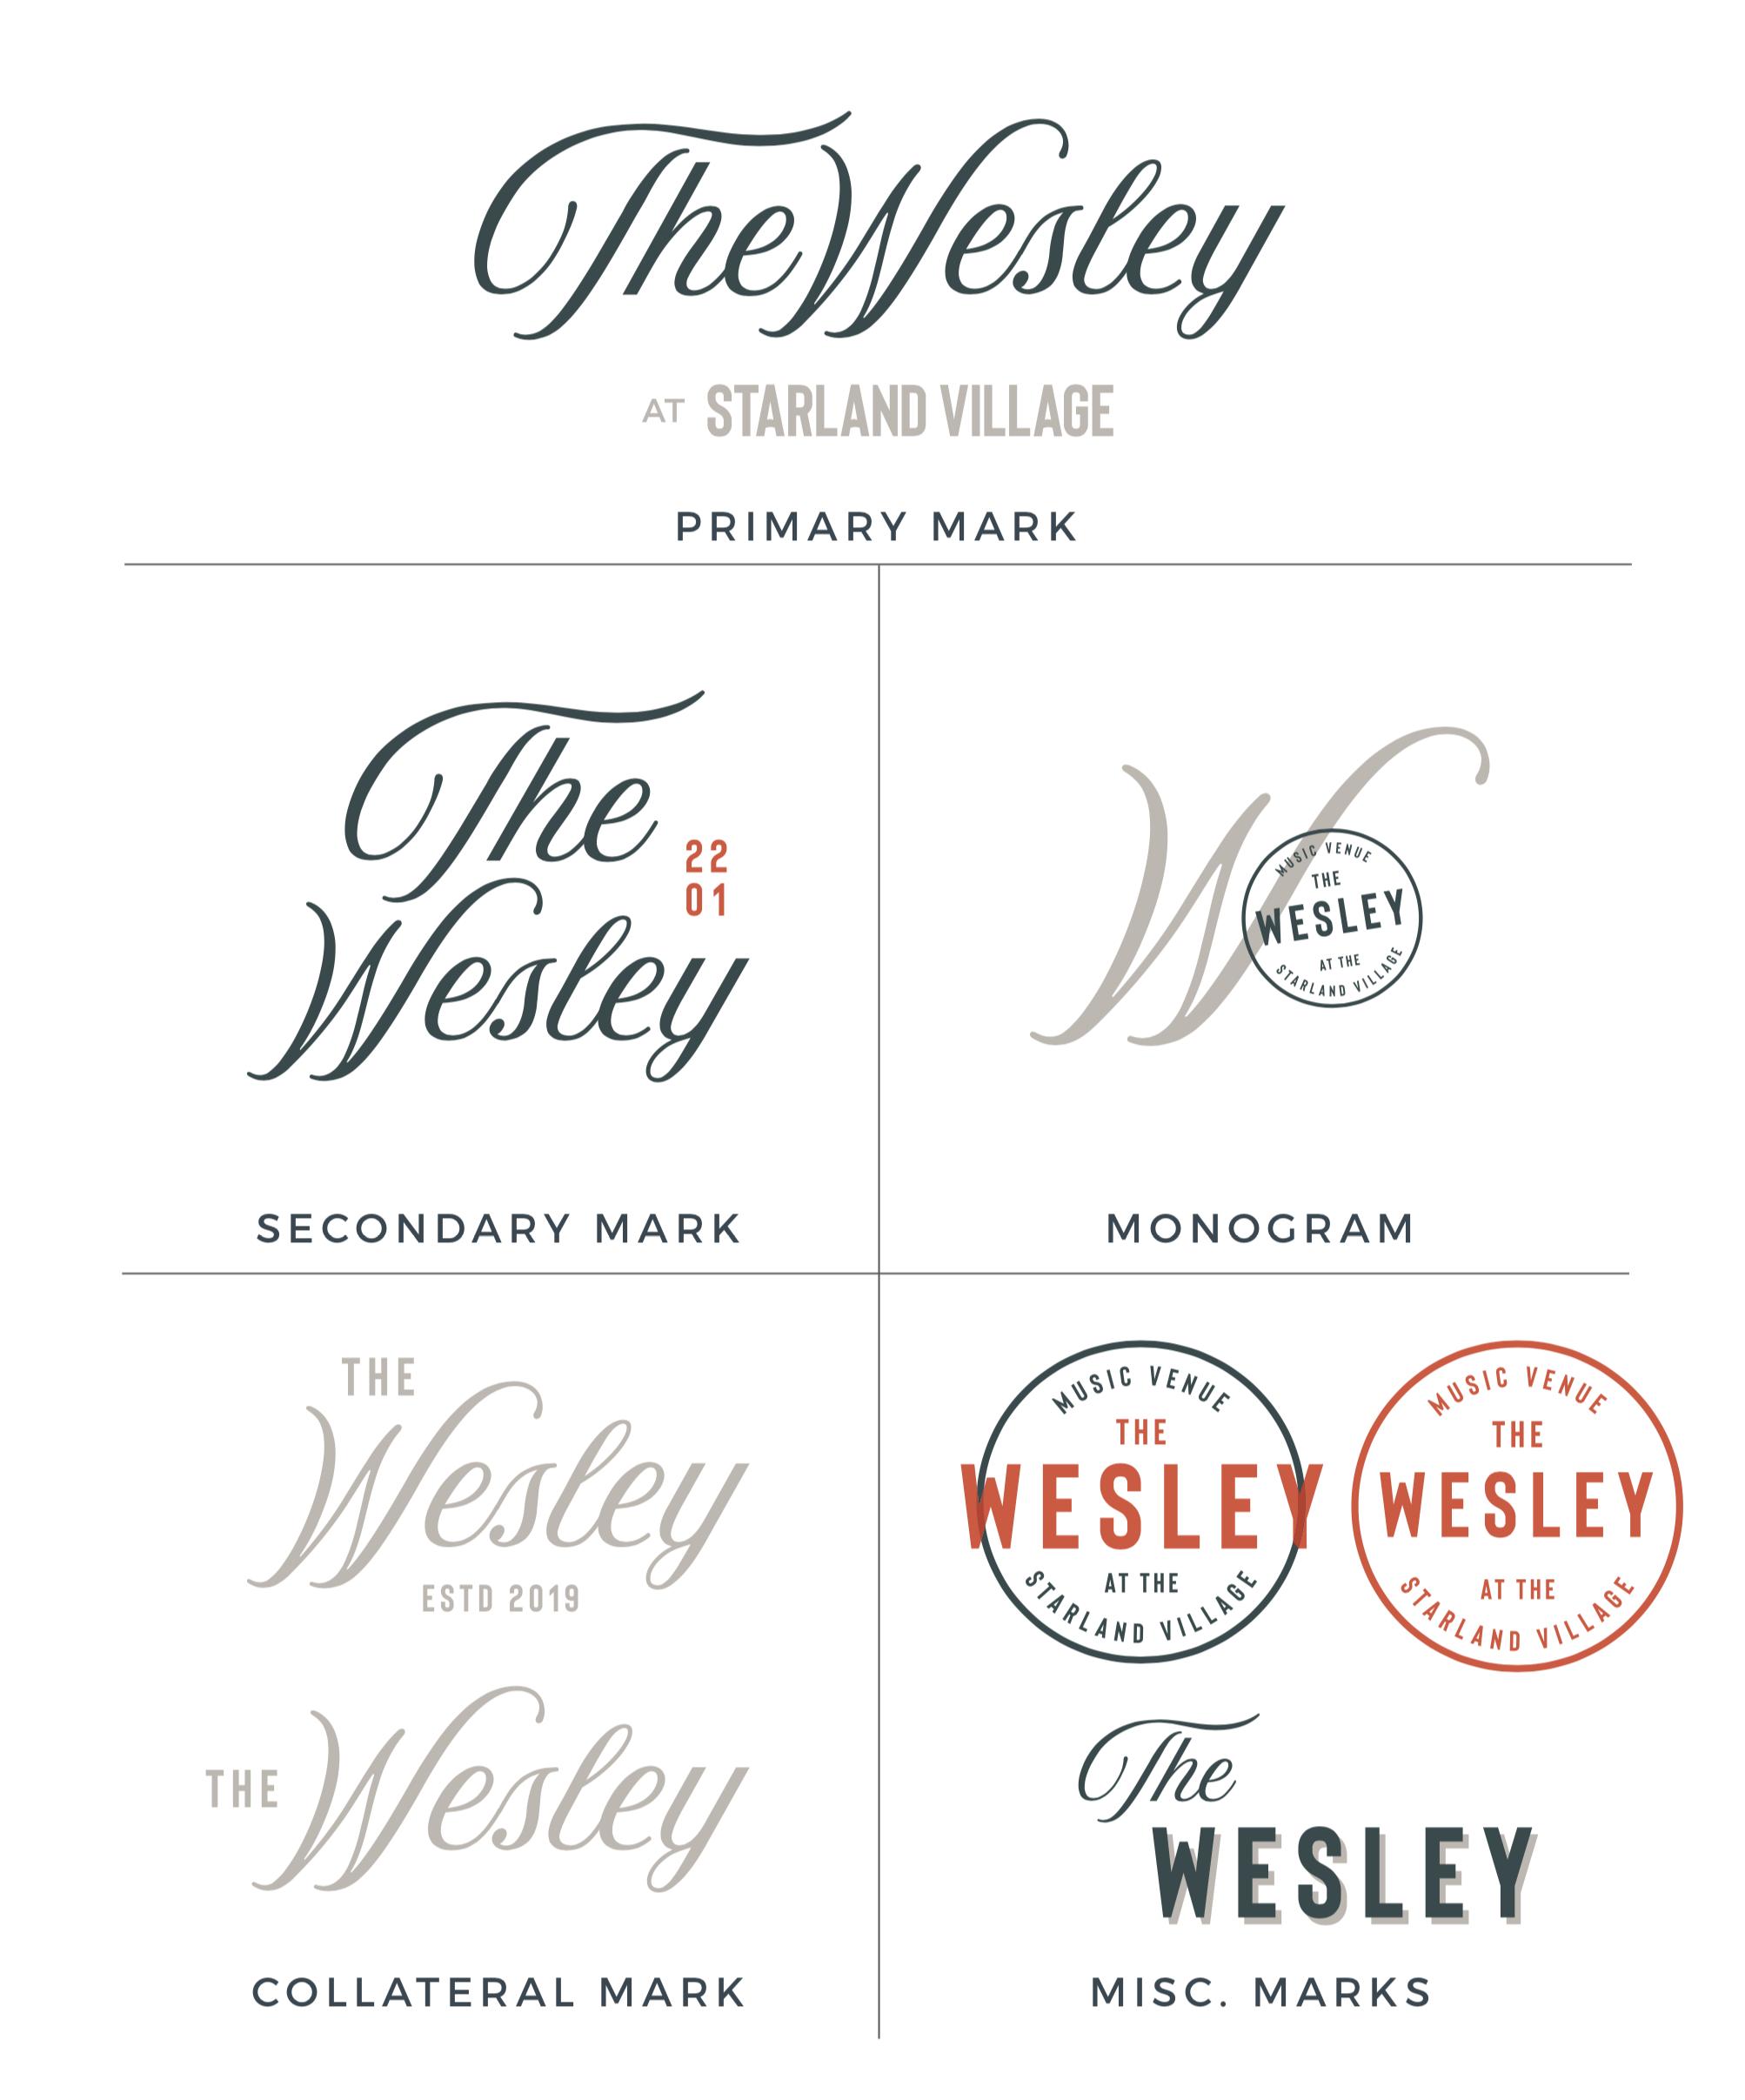 Flourish-Collaborative-Branding-Agency-Starland-Village-Savannah-The-Wesley-Logo2.png